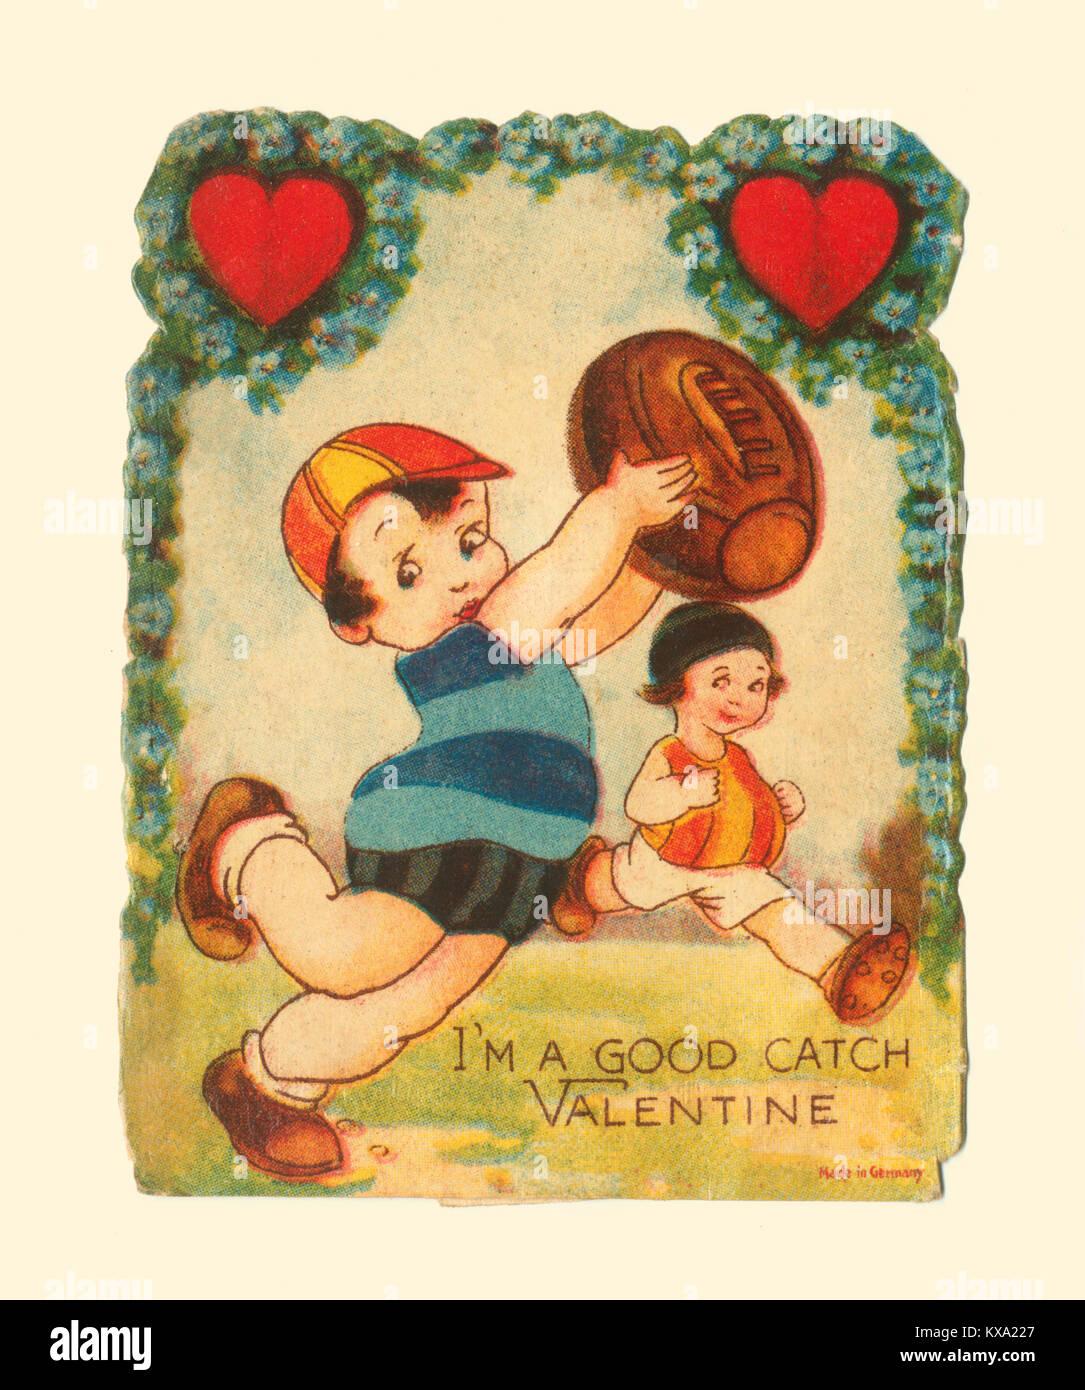 I'm A Good Catch Valentine - Stock Image